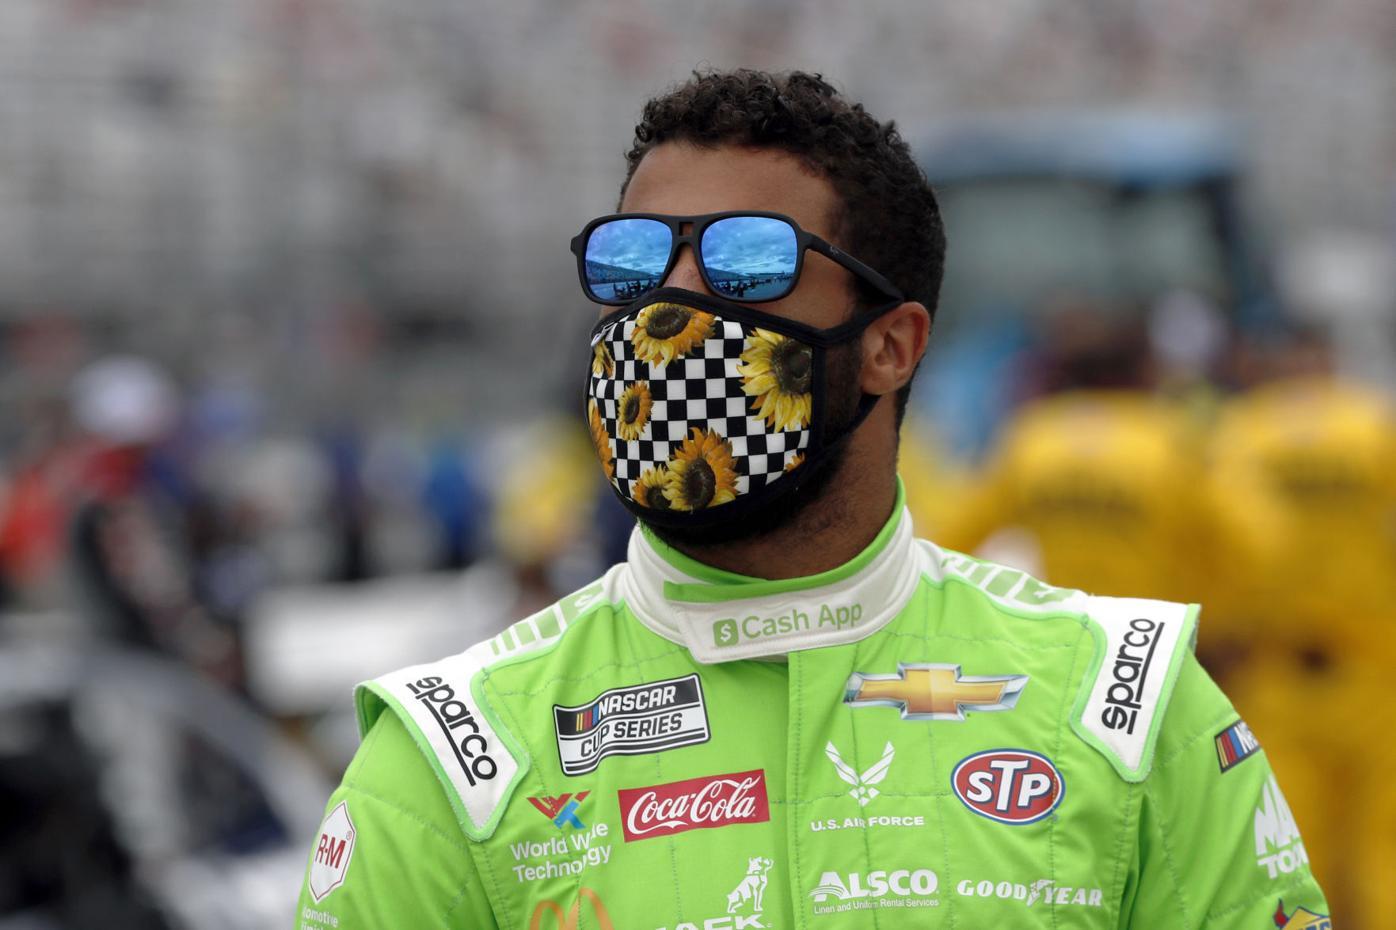 NASCAR 23Xi Sponsorship Auto Racing